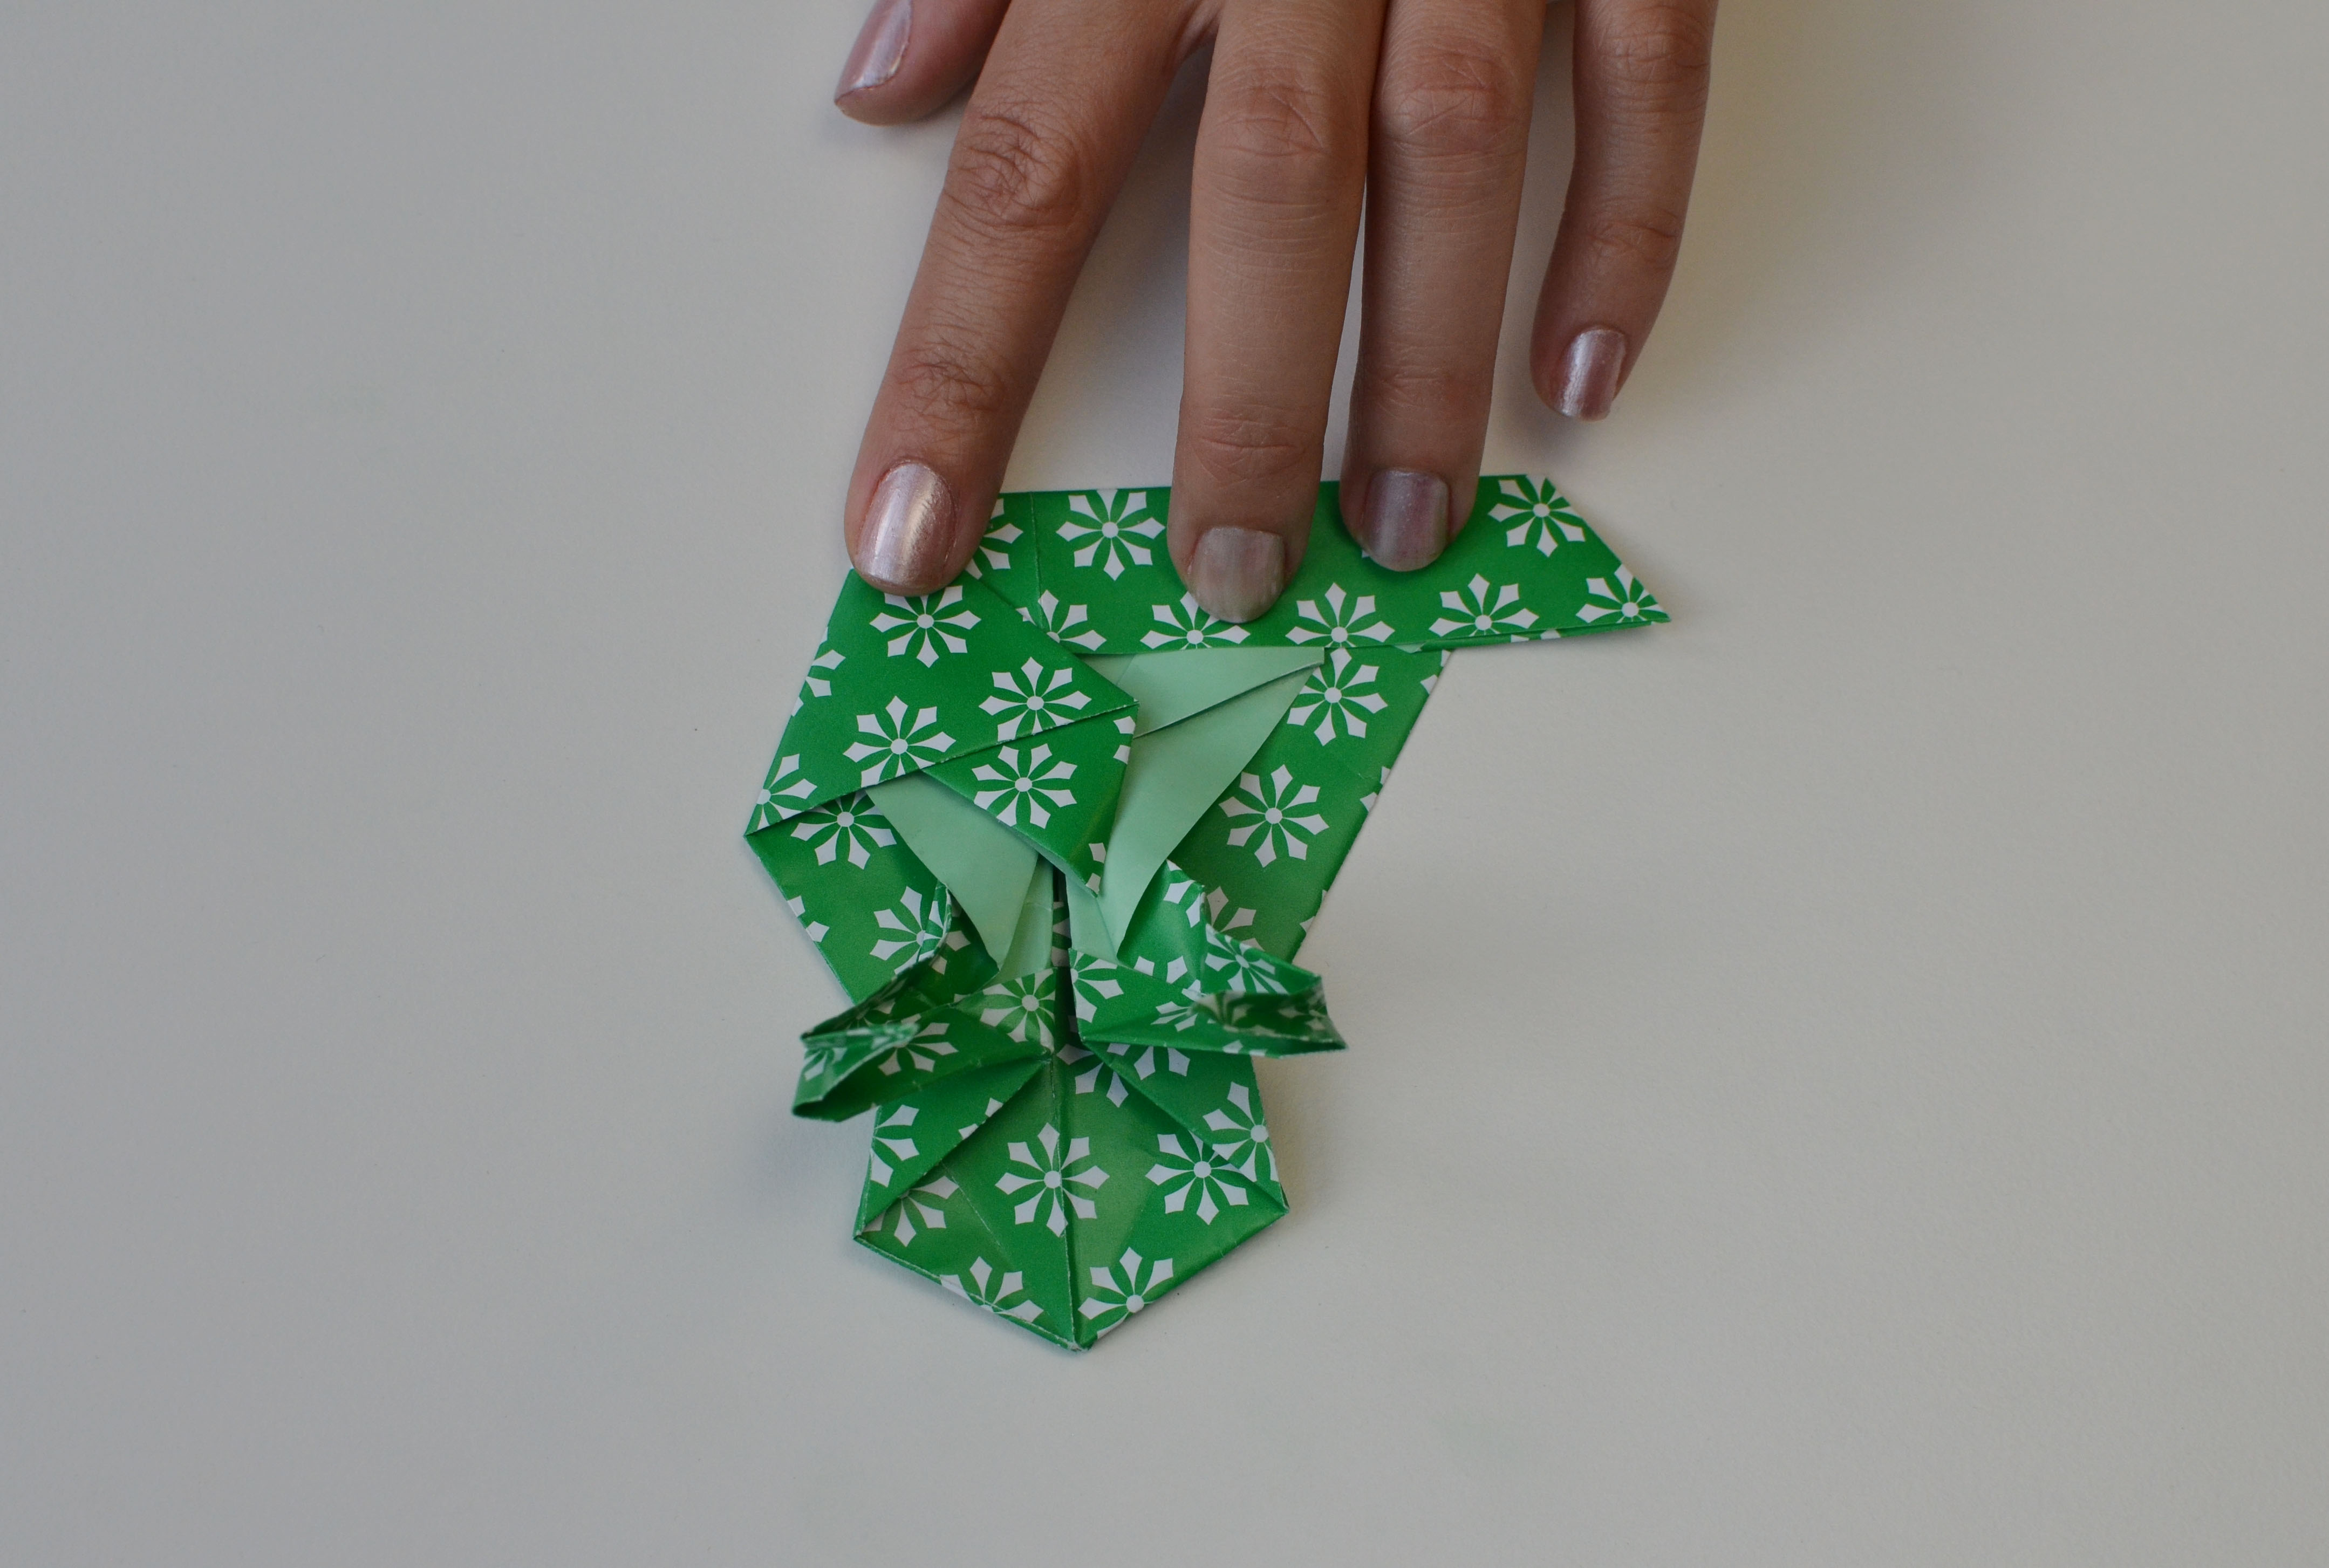 braincrafts_frog_origami_pt51.jpg